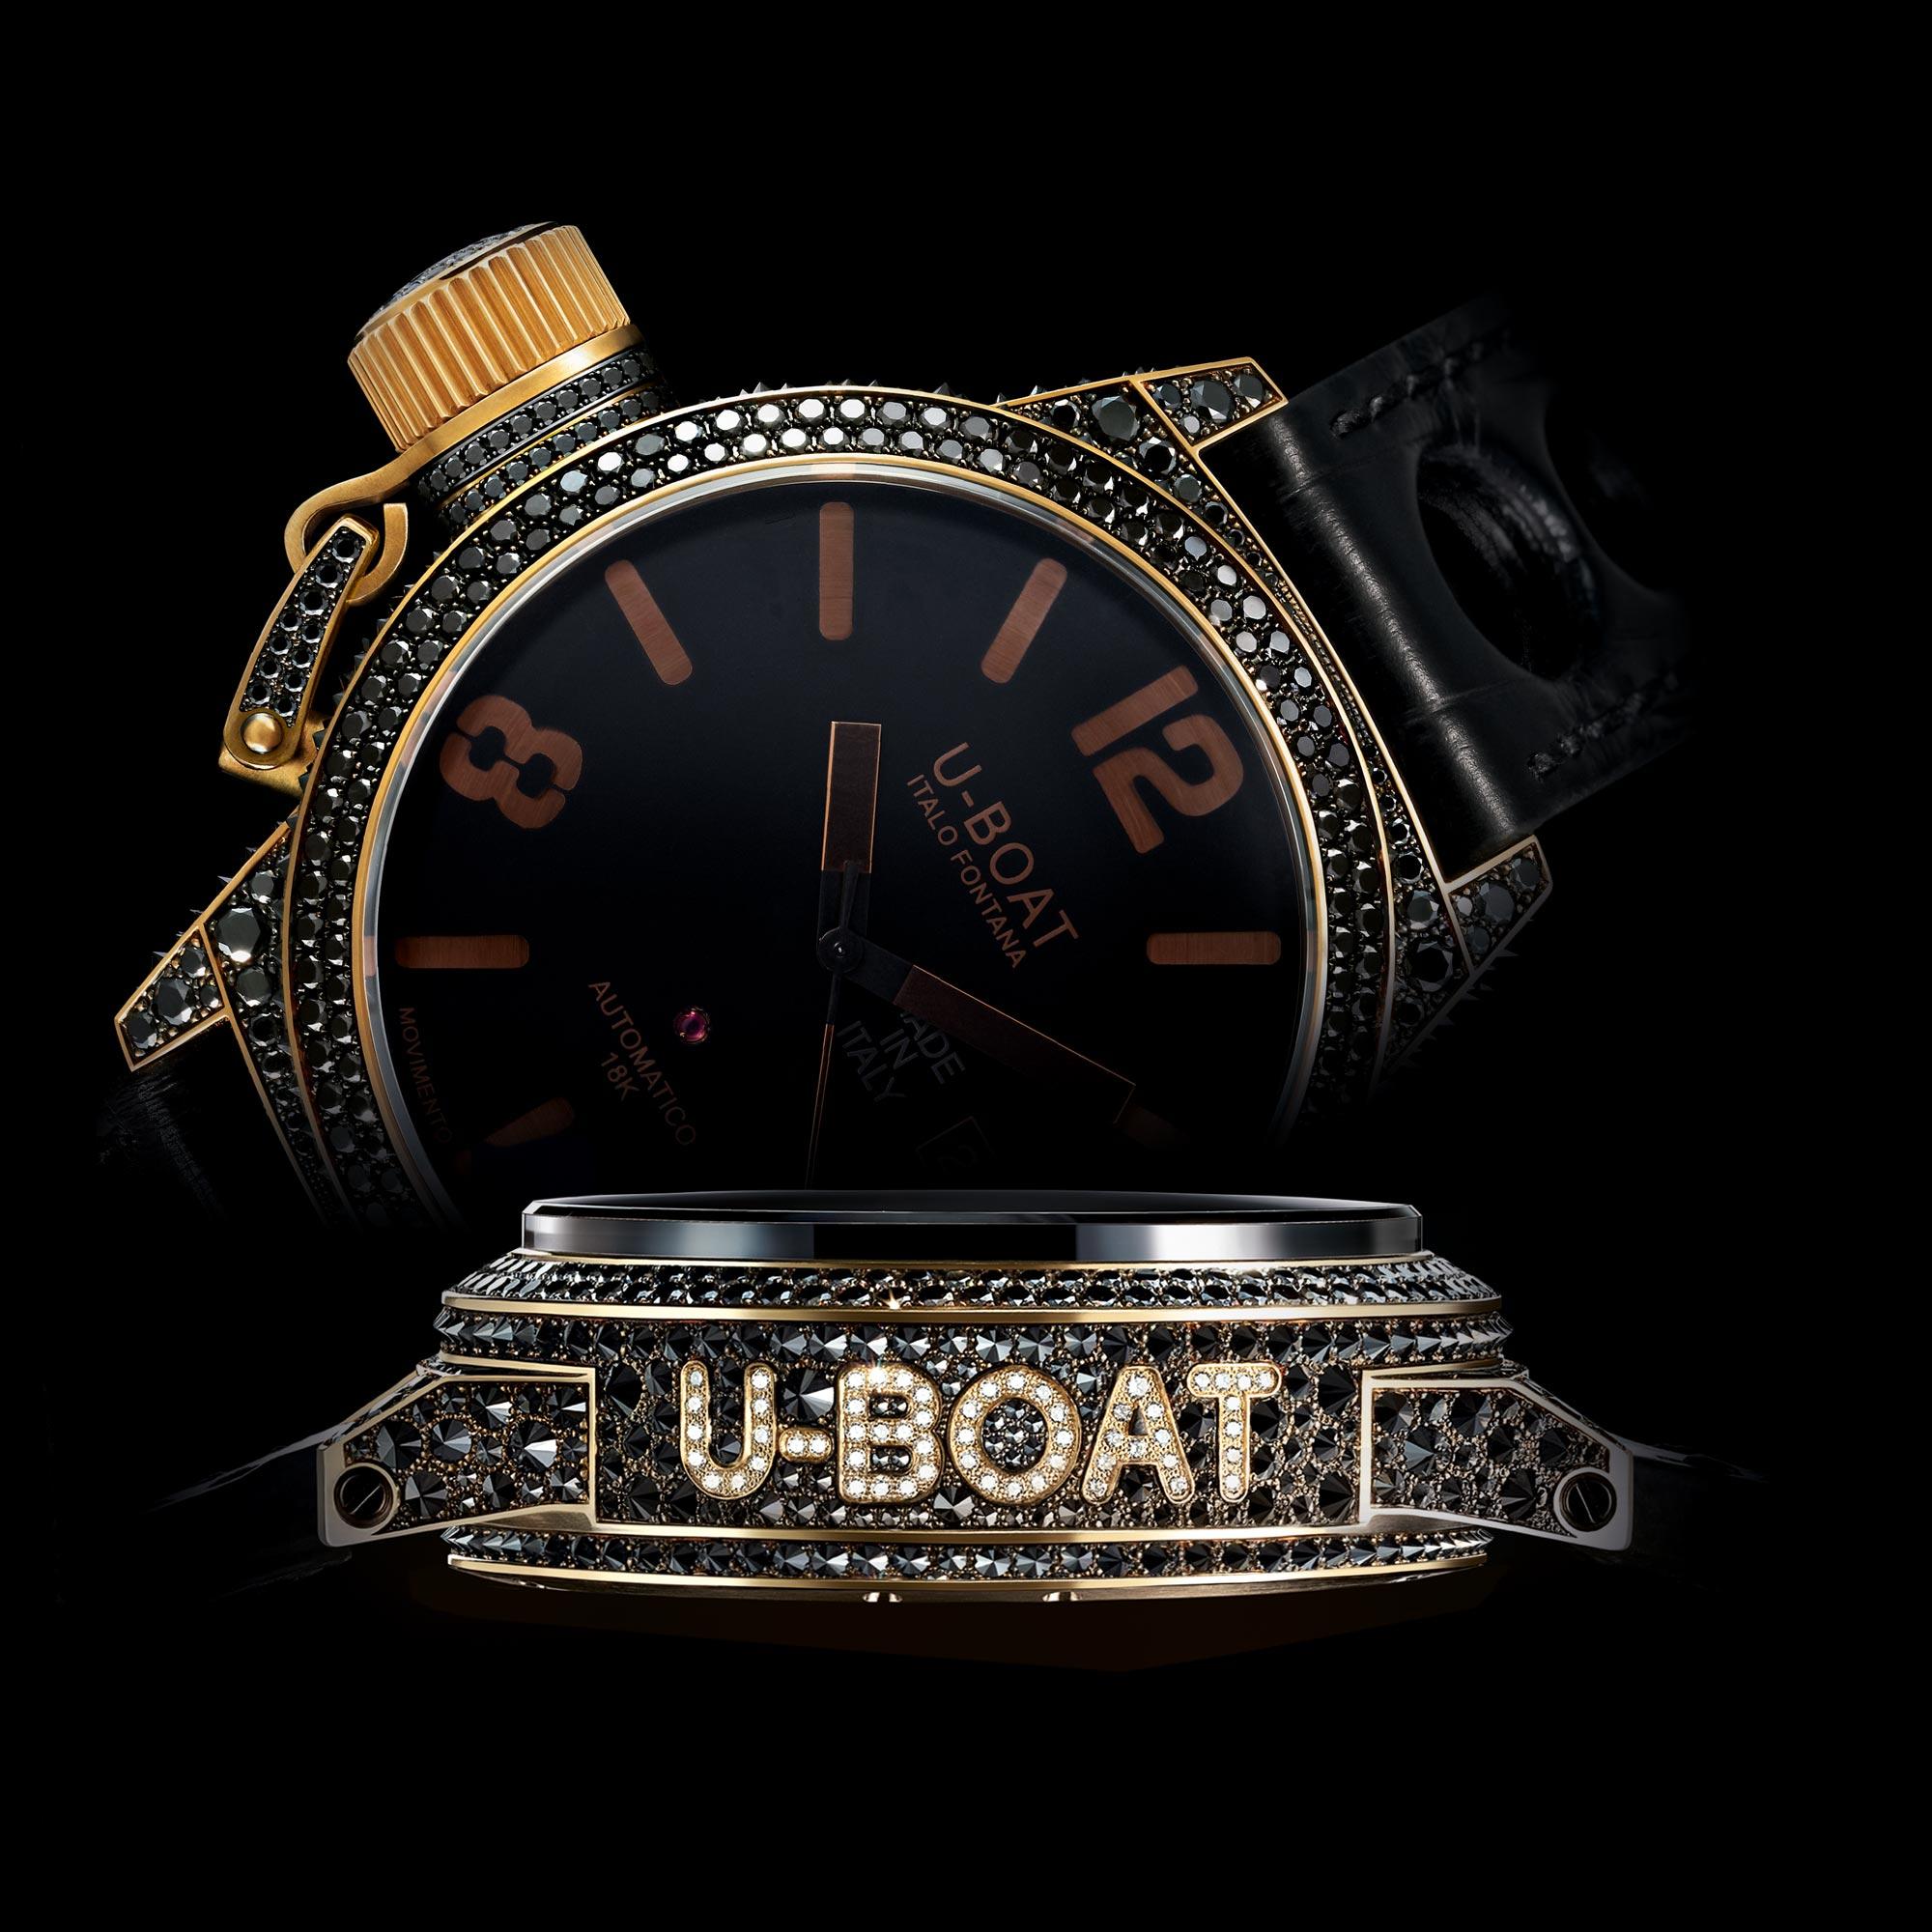 balck-dial-u-boat-precious-black-swan-8000-replica-watches